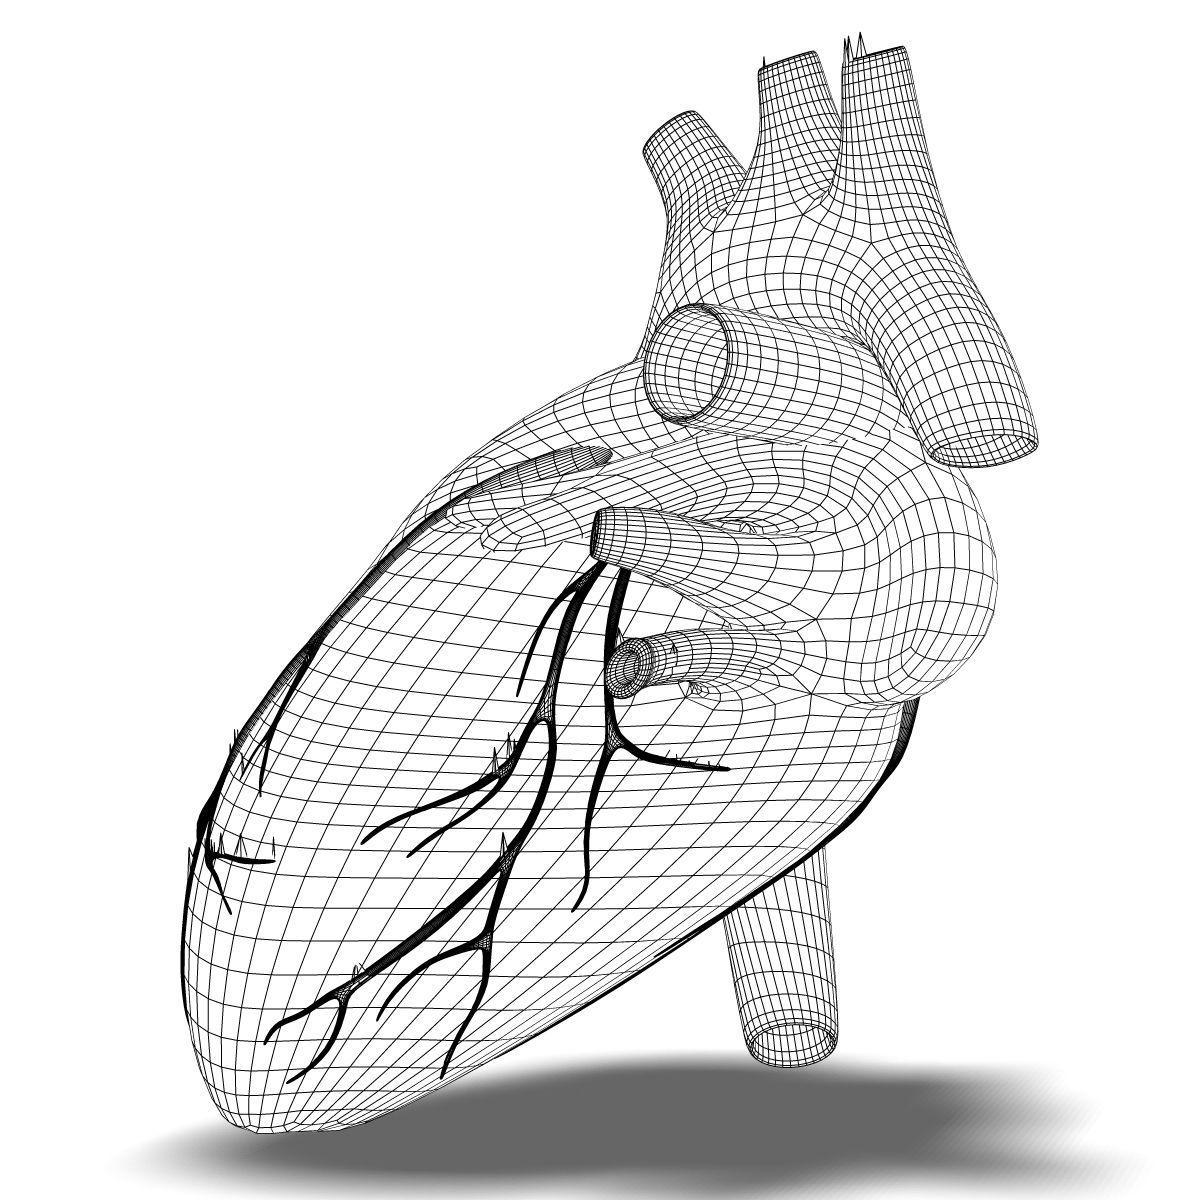 Human Heart Anatomy Drawing